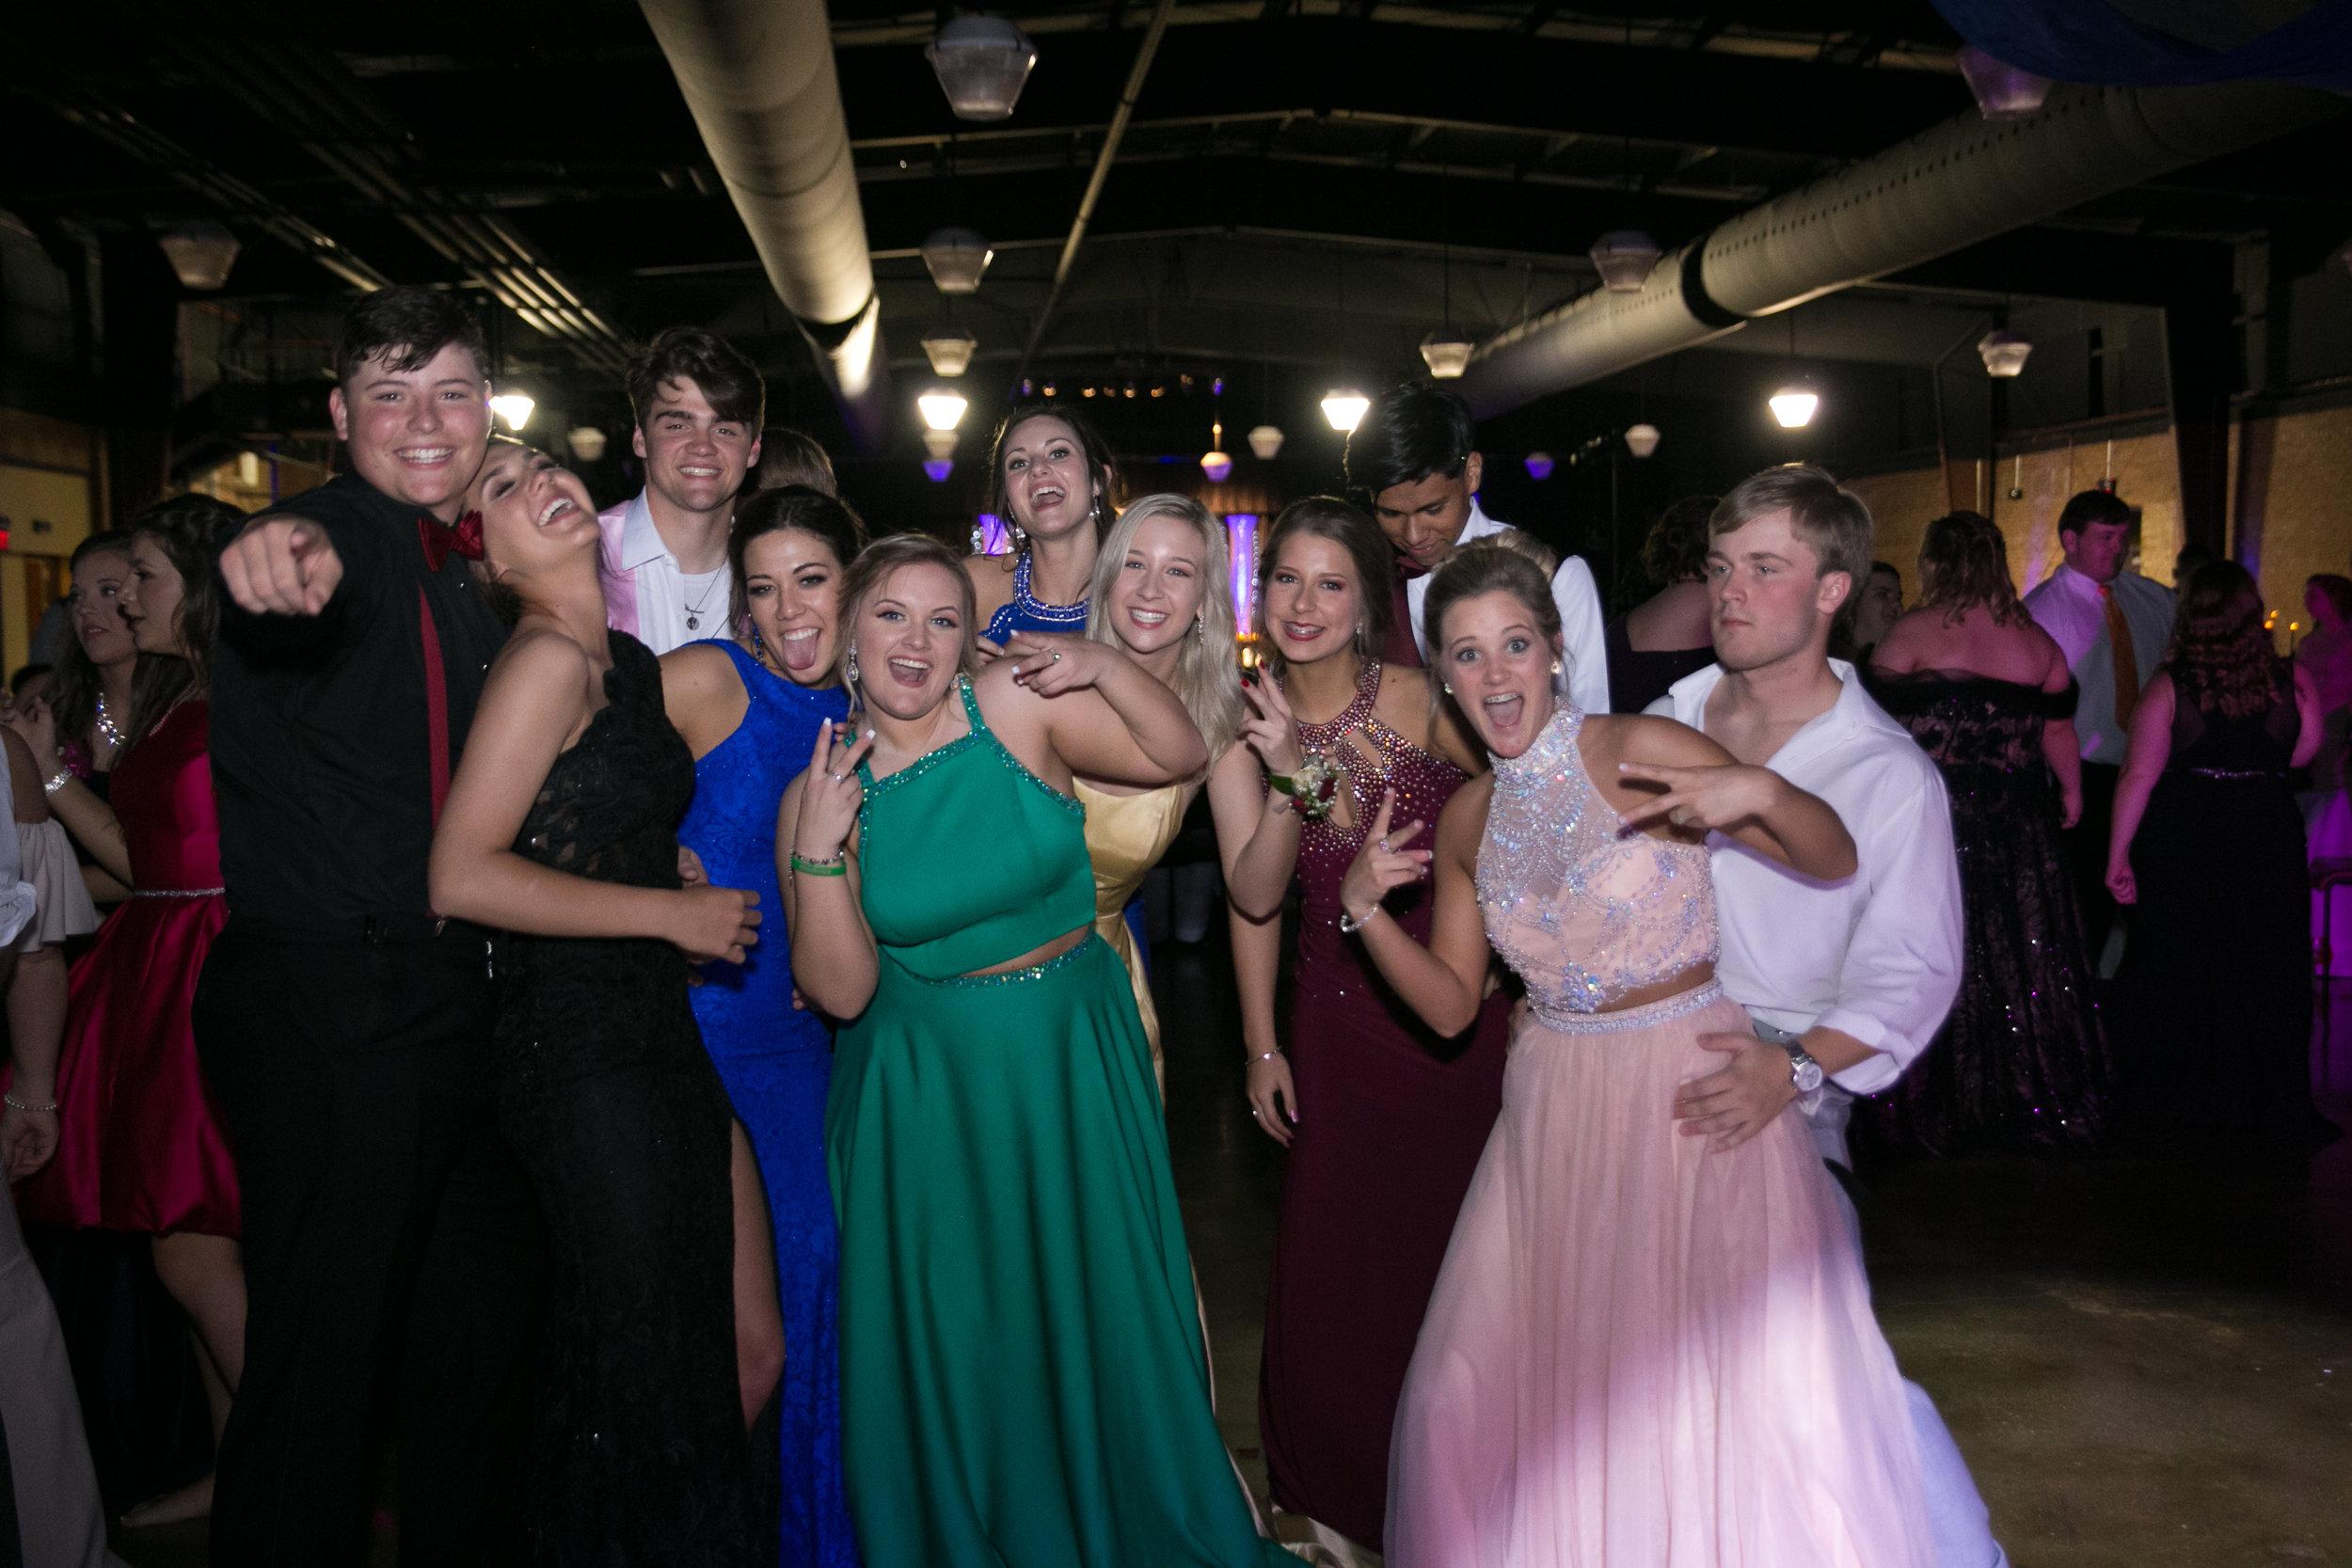 Nashville_Wedding_Photographers_DJ_Lighting_Bowling_Franklin (69 of 71).jpg